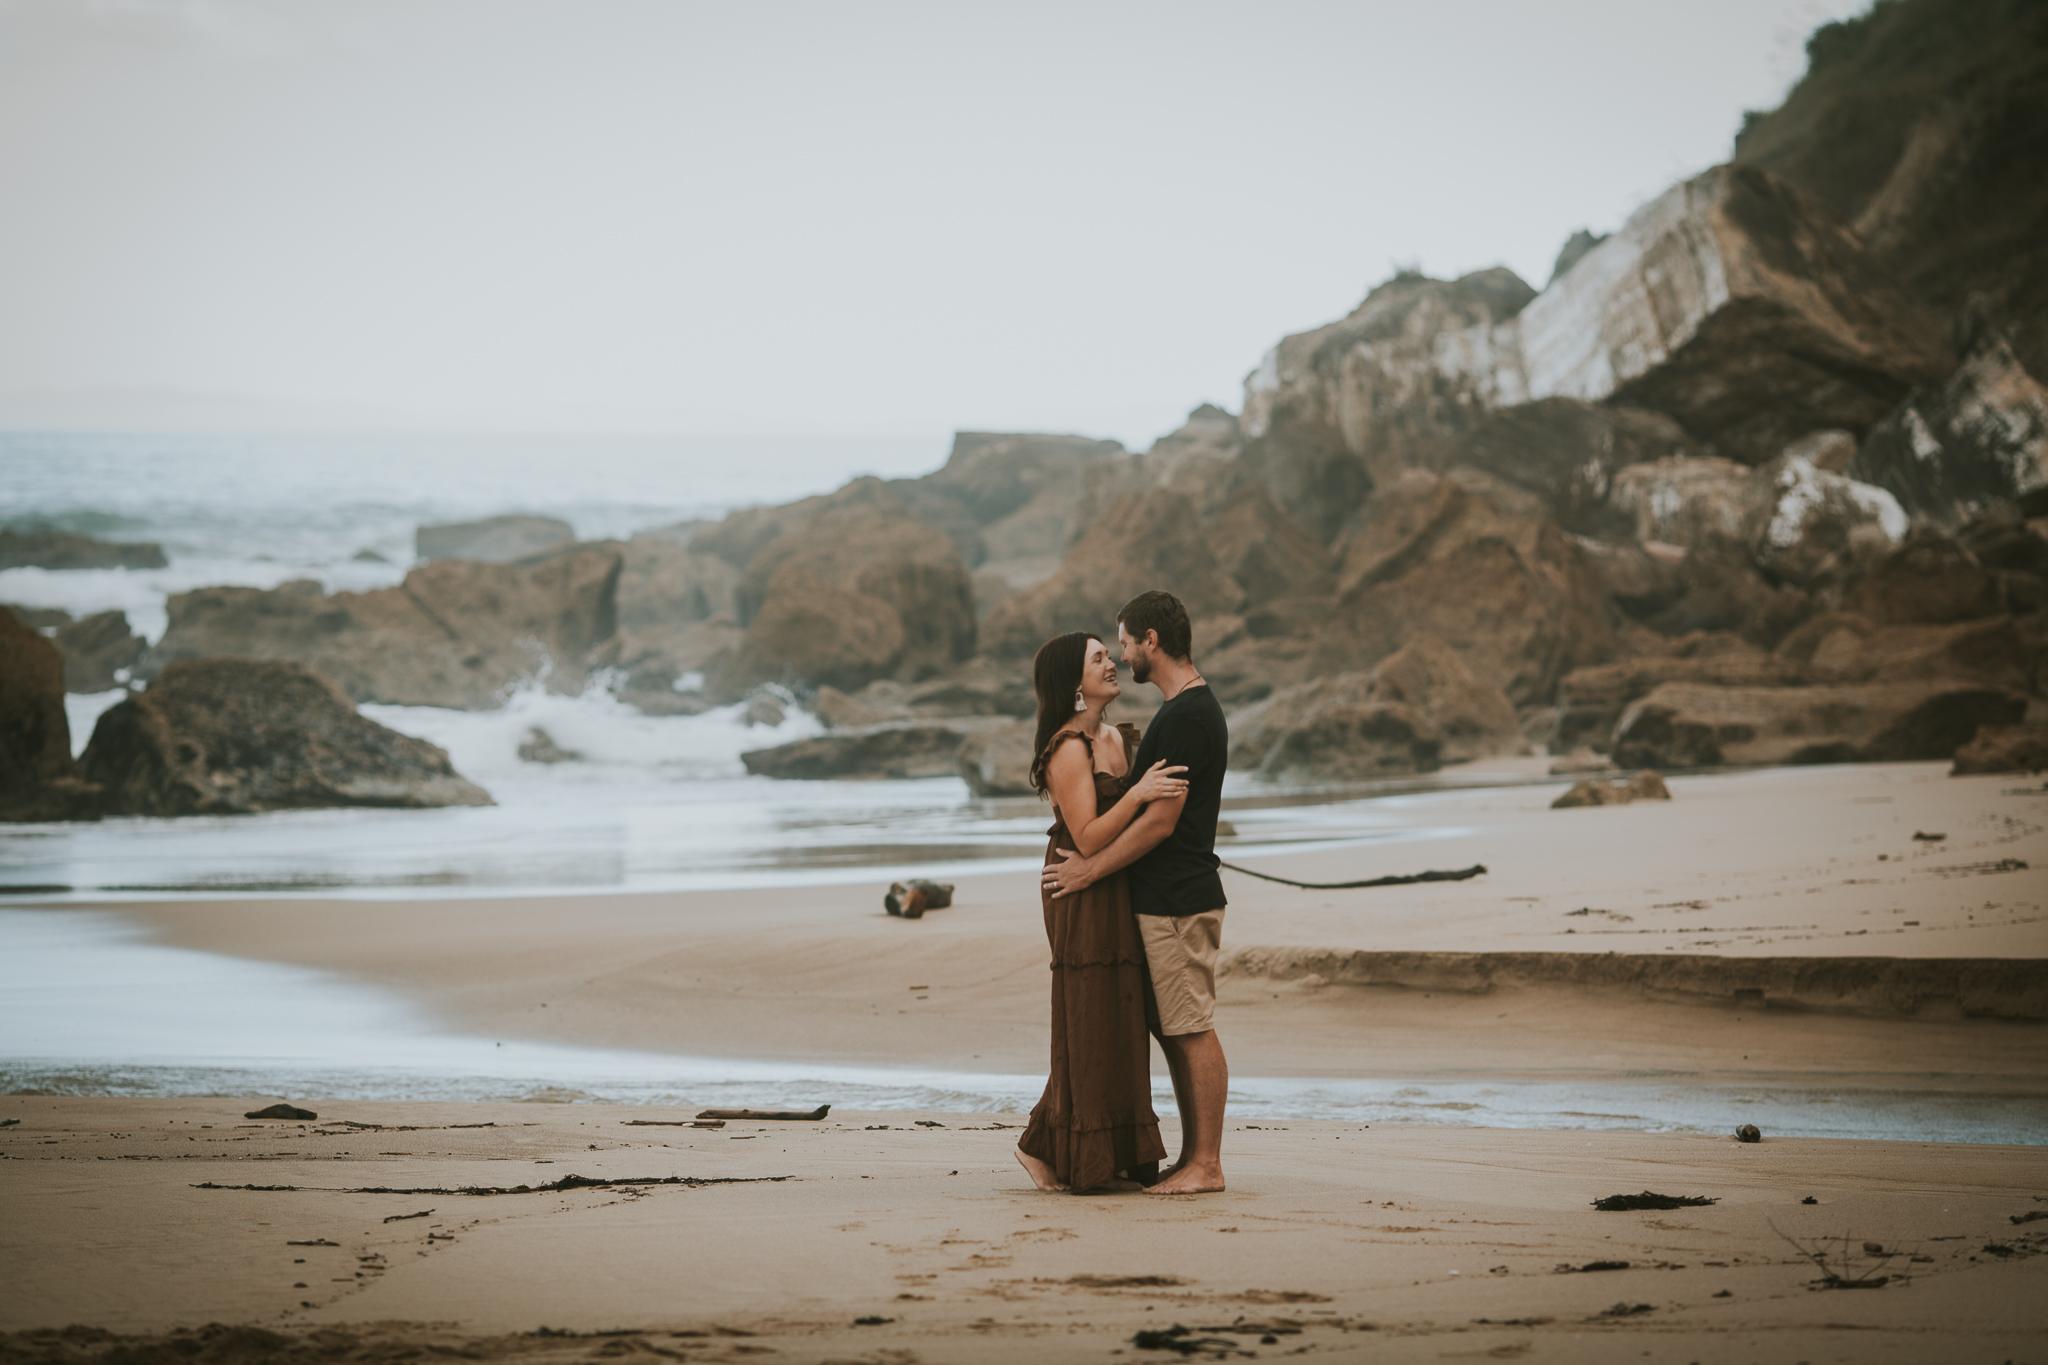 Nz Hawkes Bay Napier Wedding photographer waipatiki beach-47.jpg